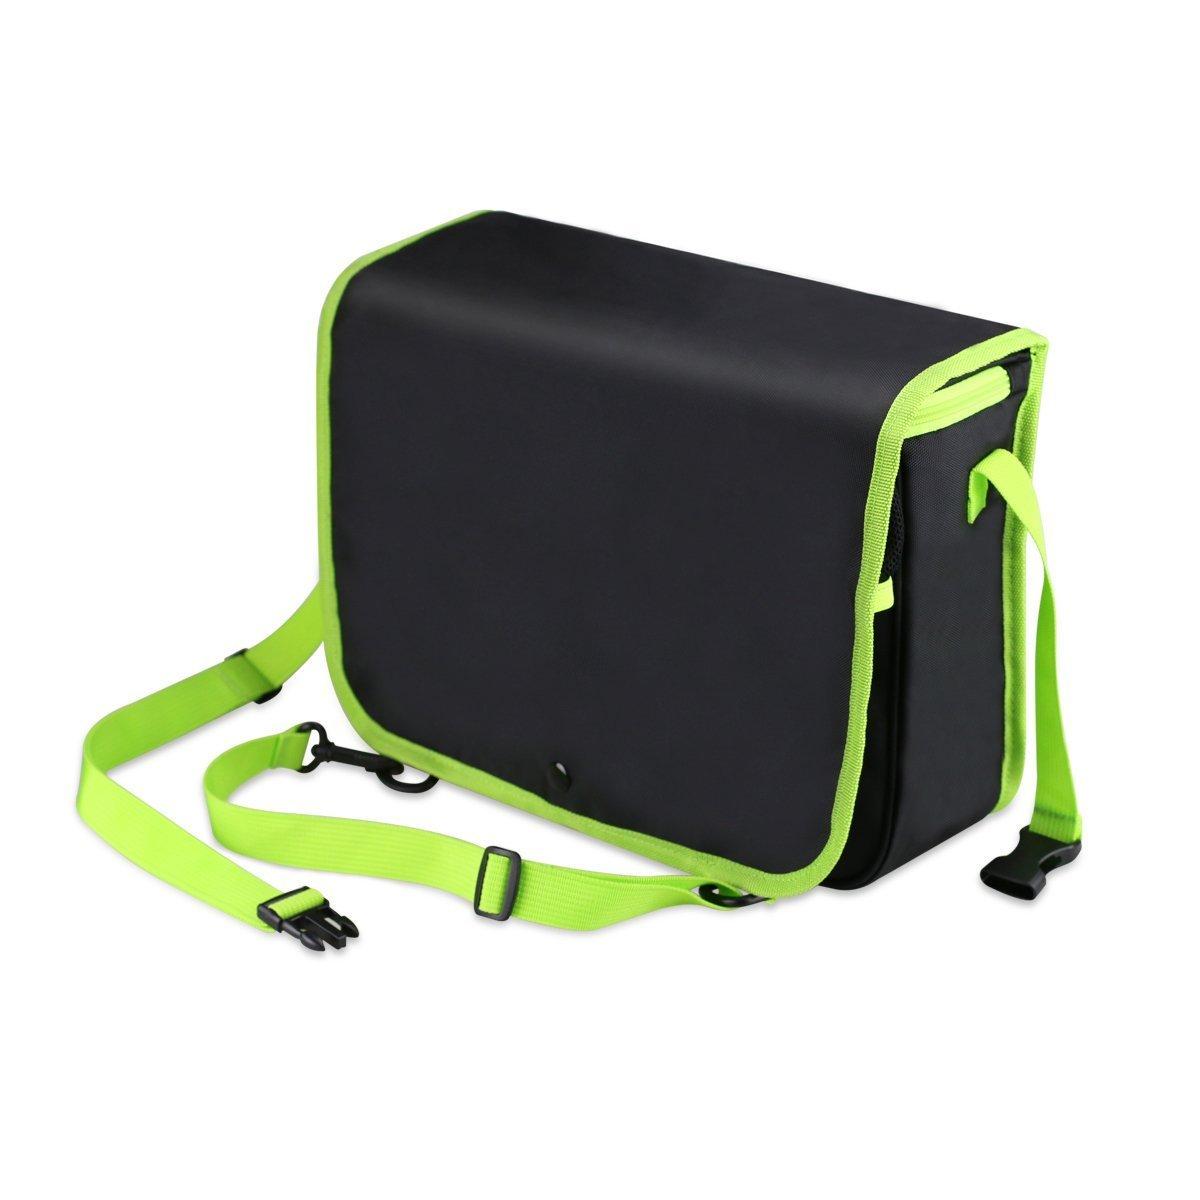 Ldex Stockage de Voiture Sac Backseat Organisateur, Multi-Pocket Voyage sac de rangement Isolation